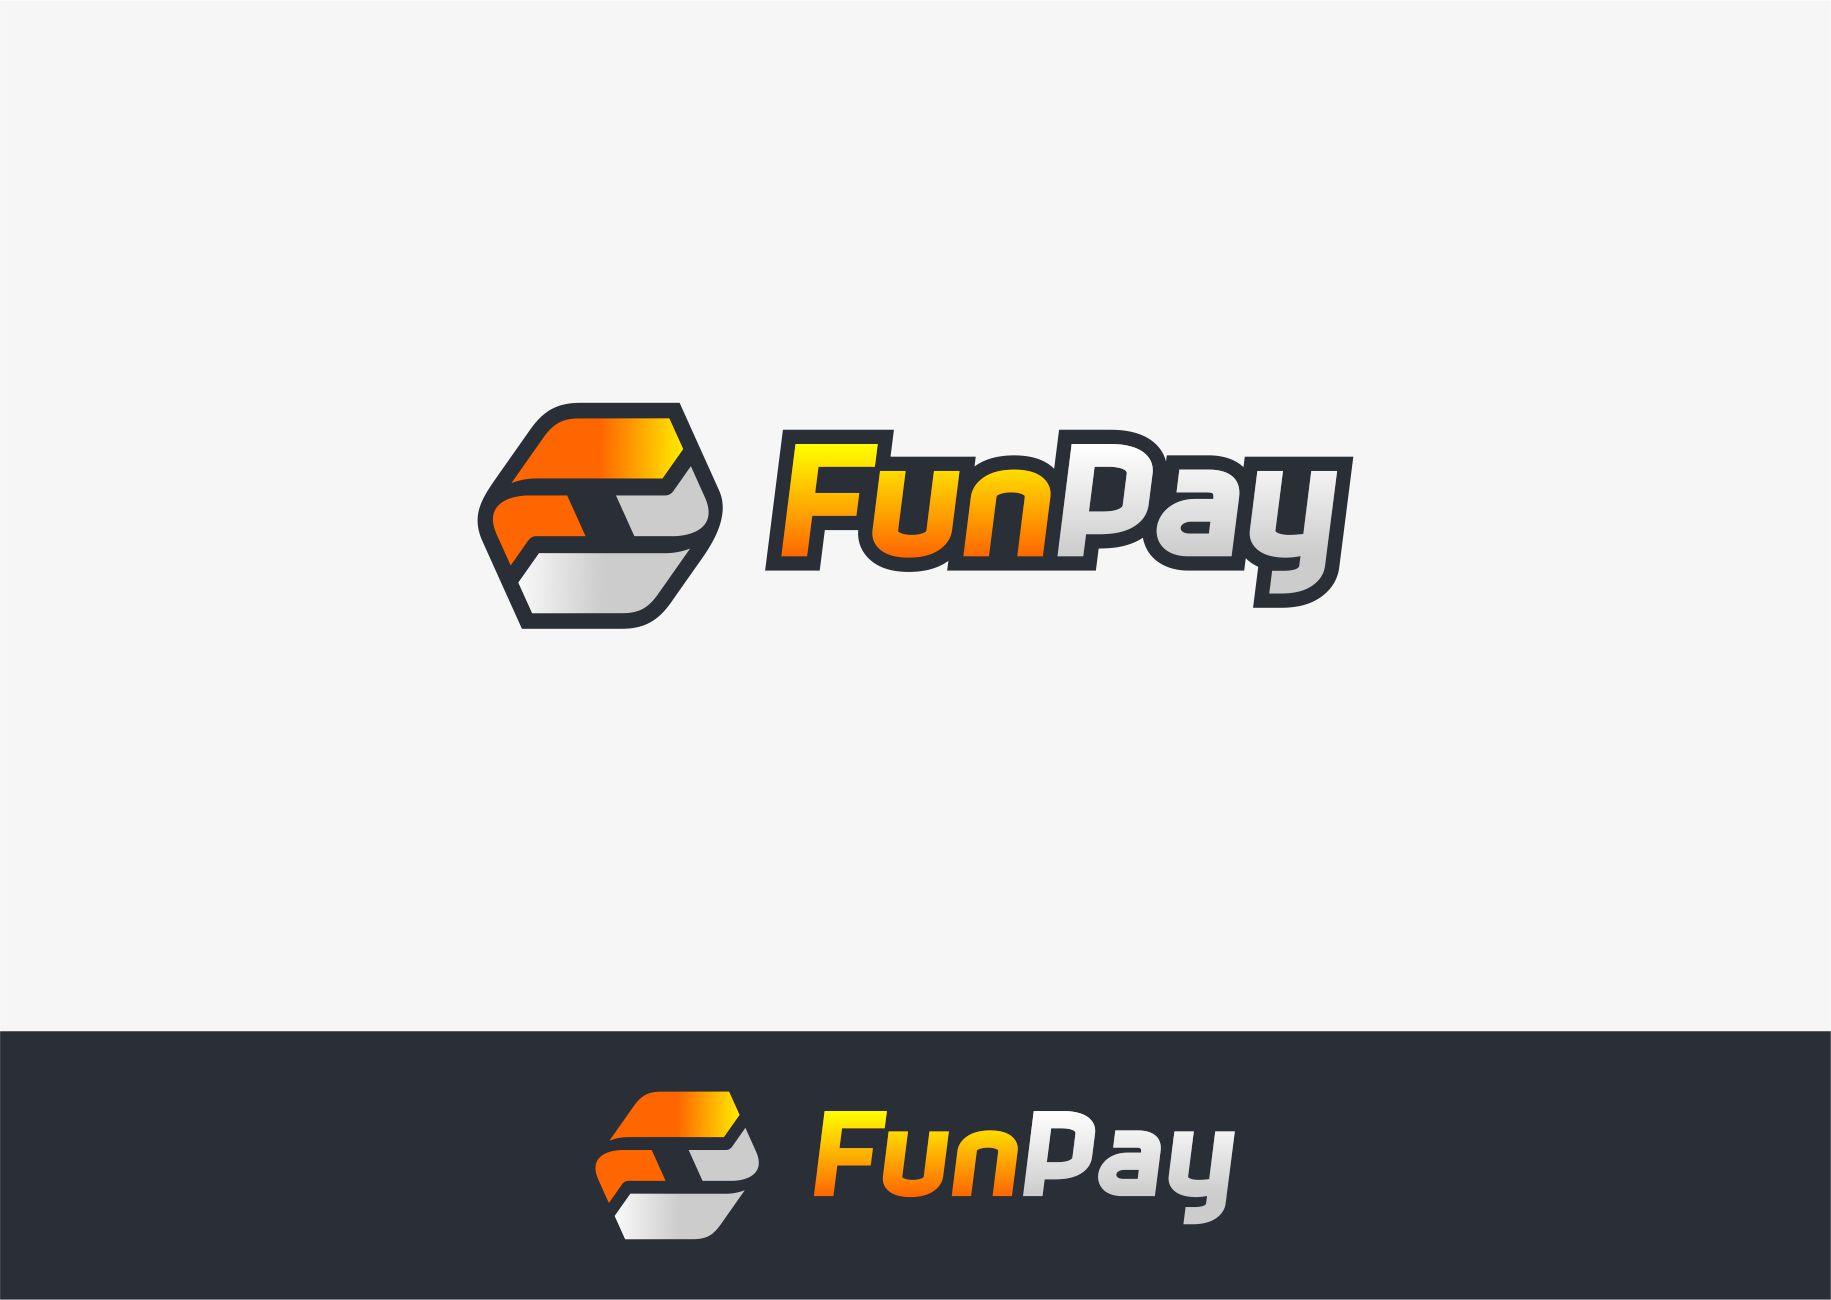 Логотип для FunPay.ru фото f_5575991eb301ef1c.jpg